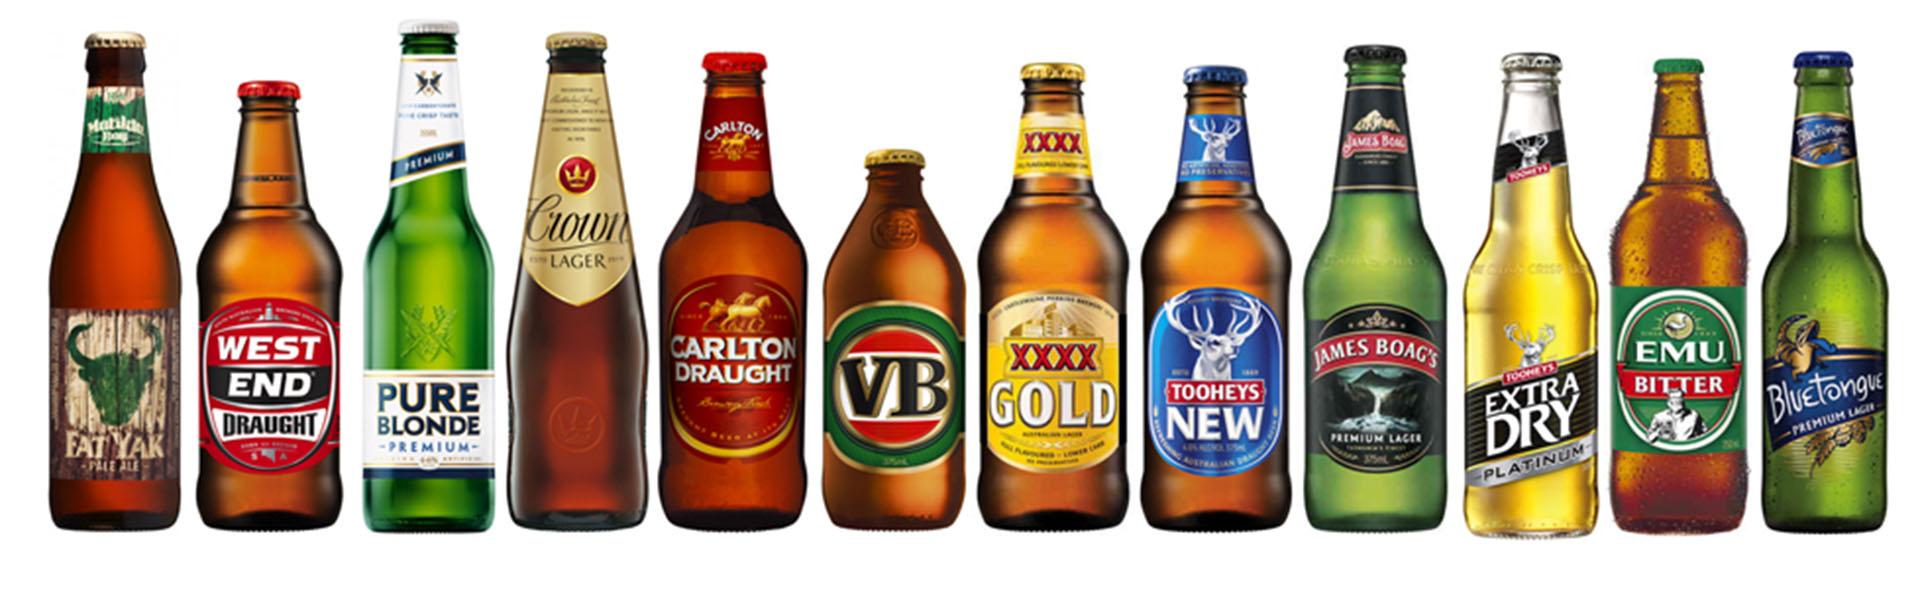 фото марок австралийского пива